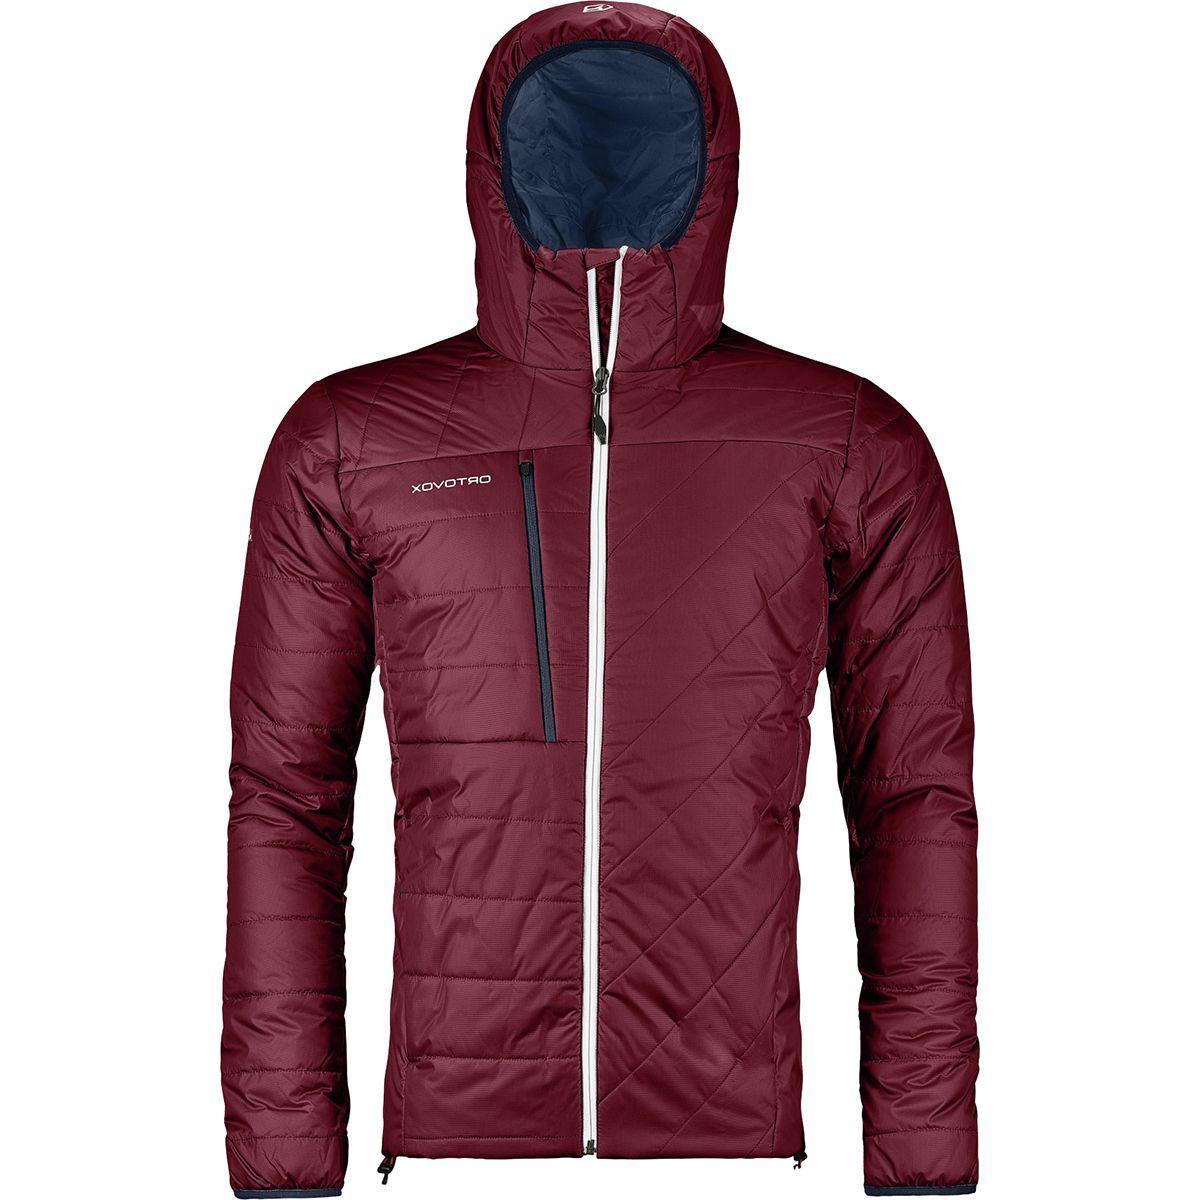 Ortovox Piz Bianco Insulated Jacket - Men's